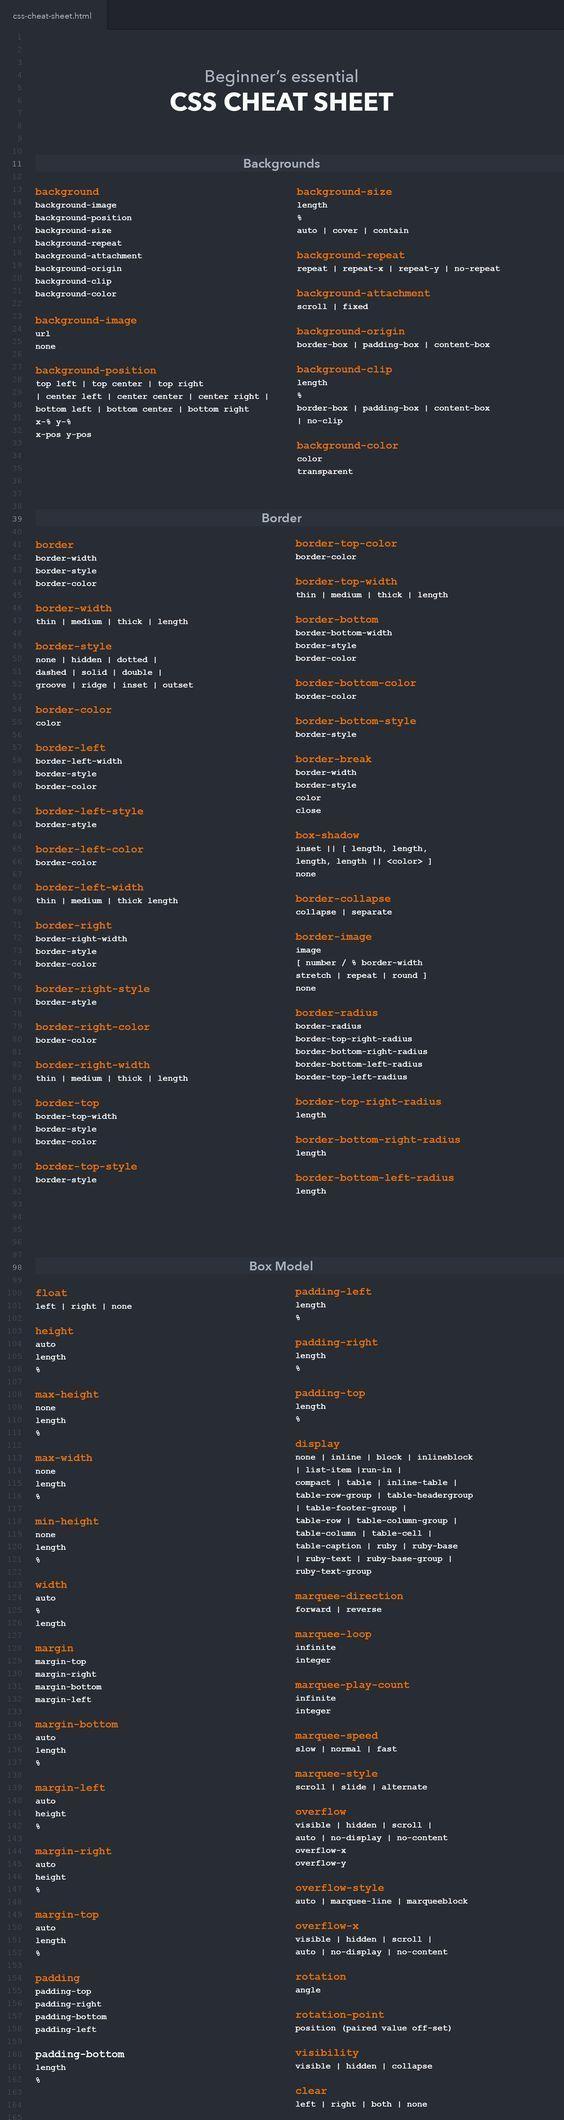 #Adarsh_Bhardwaj infographic coding programming languages cheatseats Python java JavaScript linux html CSS code coder programmer beginner C C++ Web development developer programmers Computer